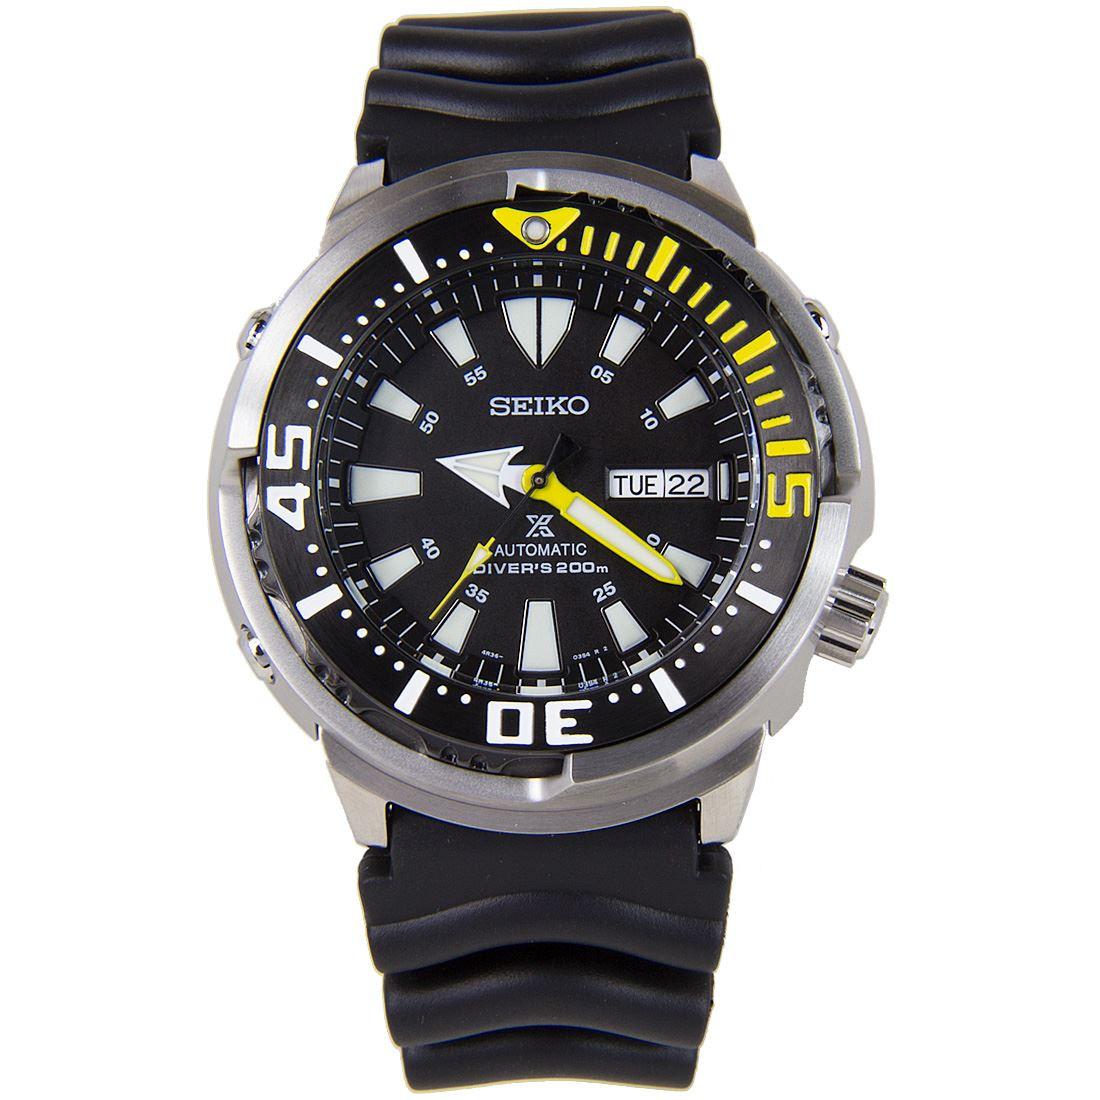 Часы Seiko Prospex SRP639K1 Automatic Diver's